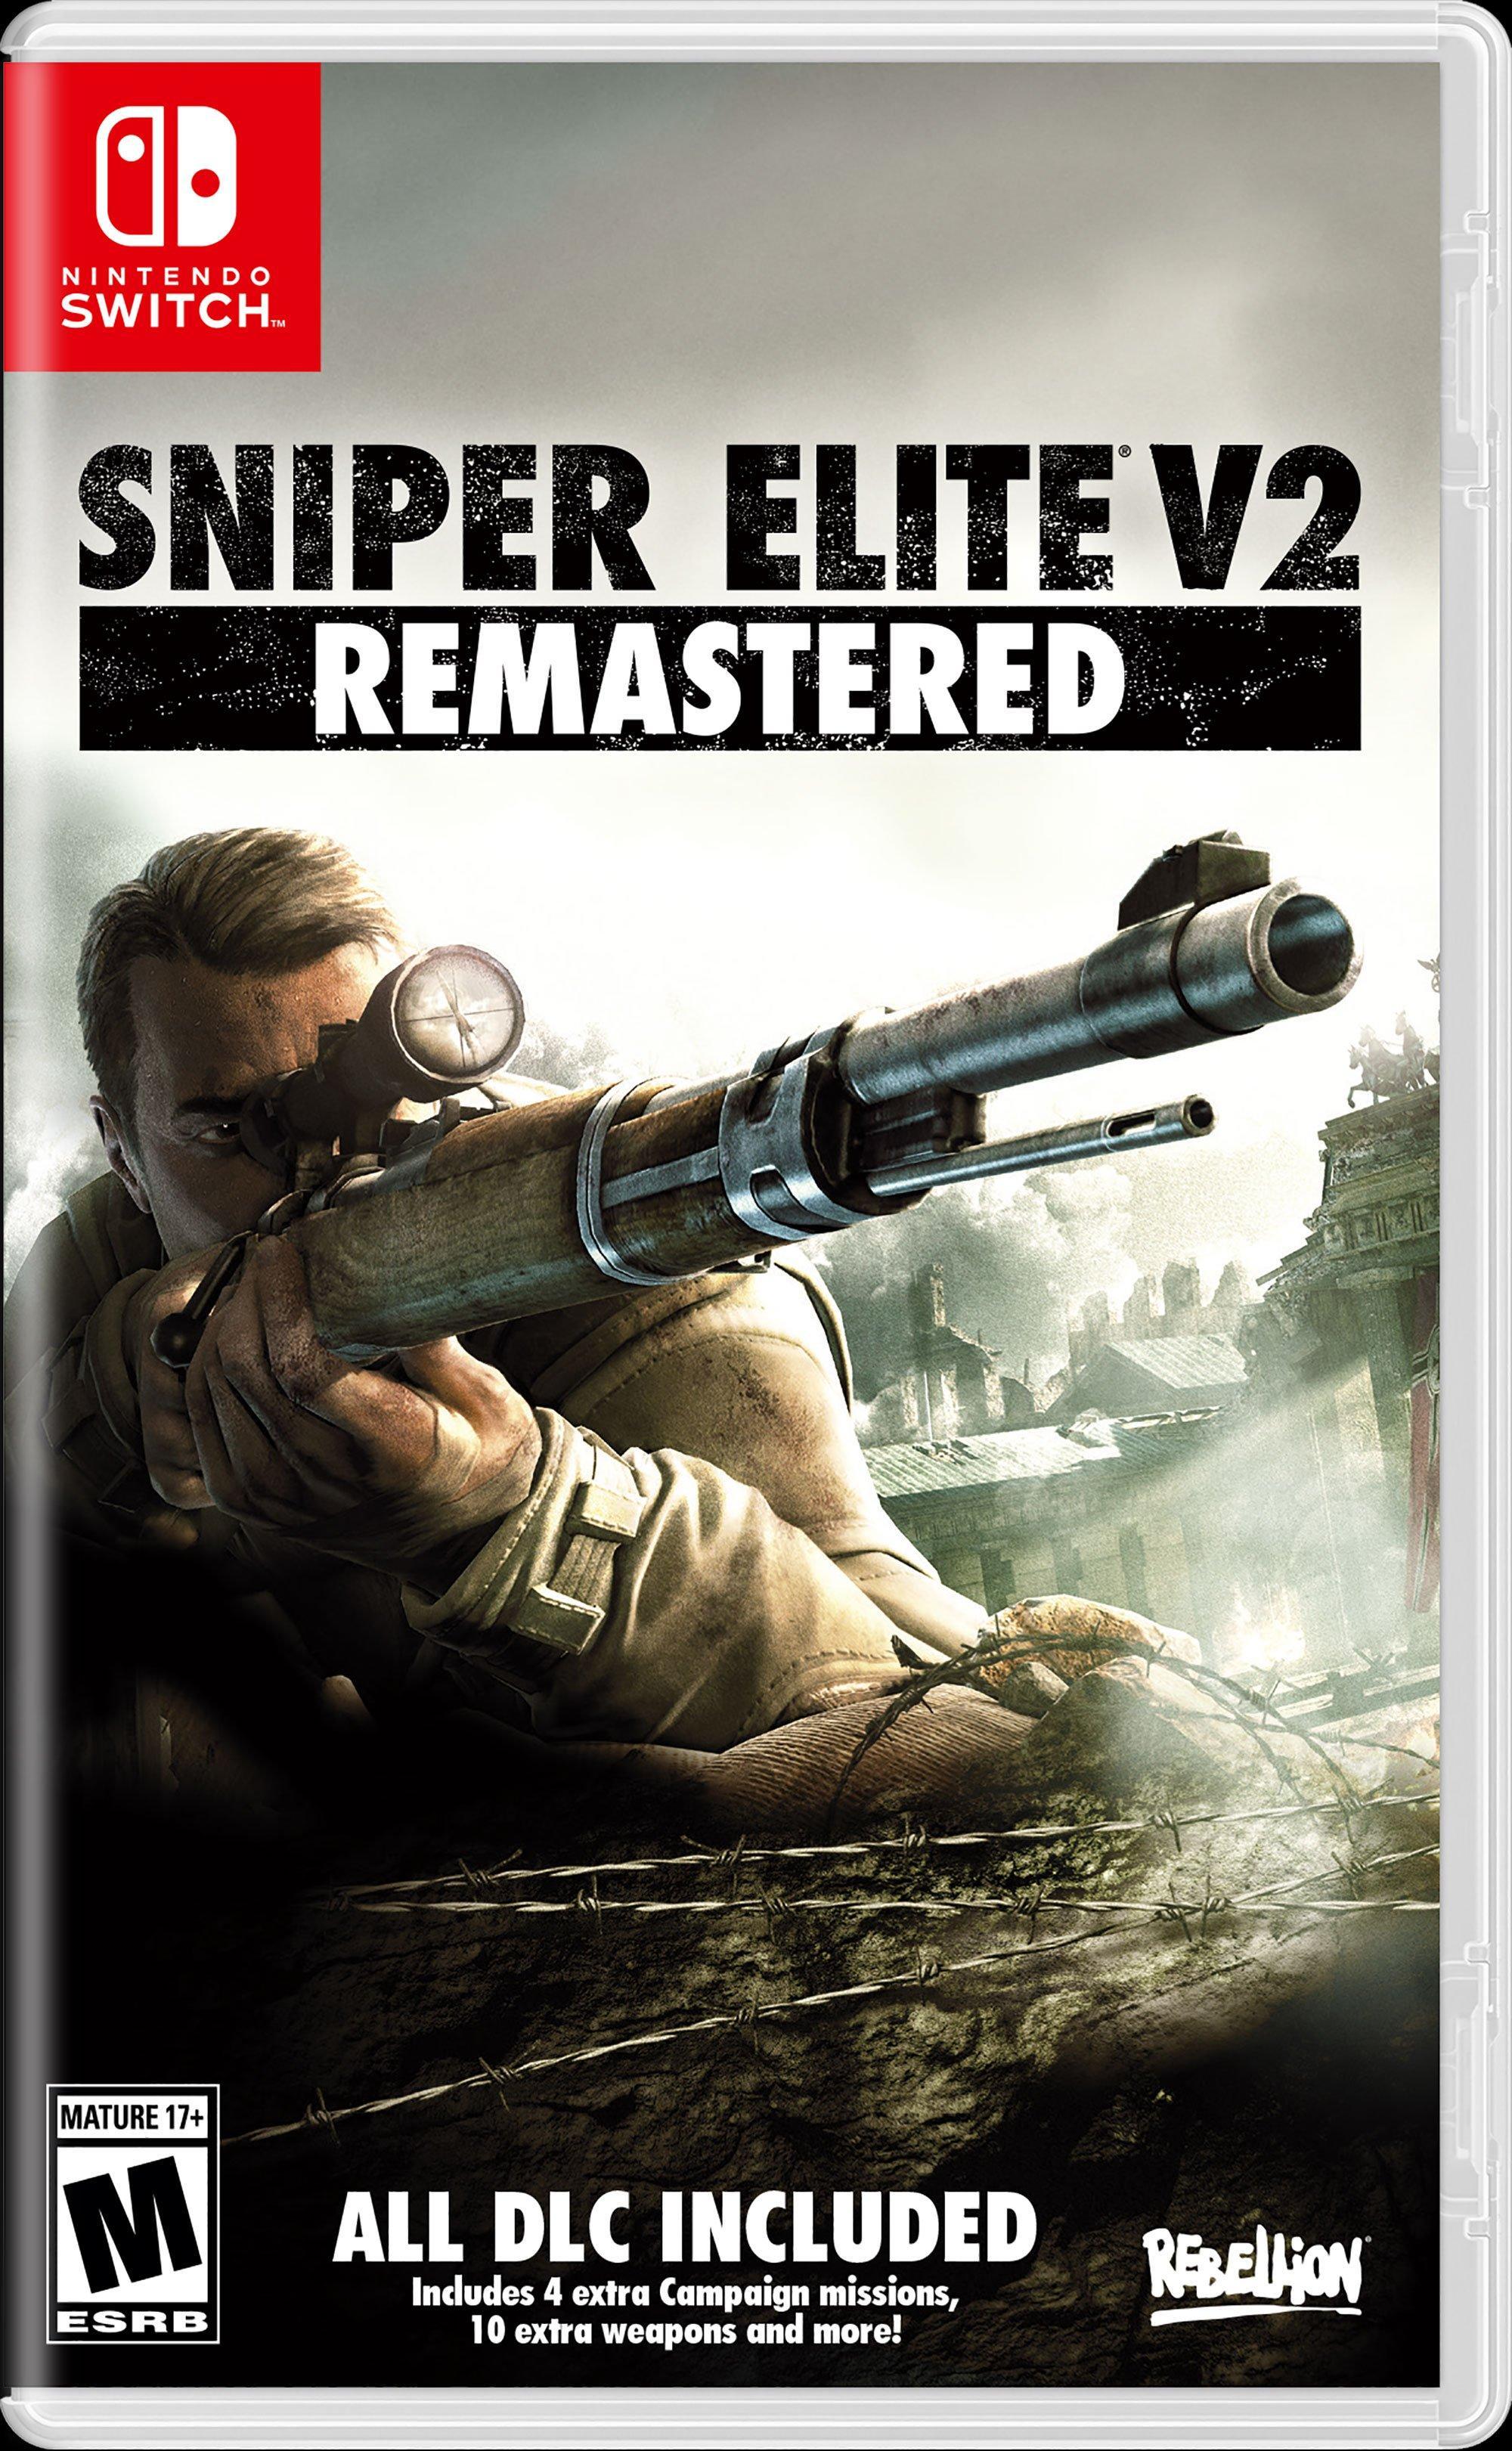 Sniper Elite V2 Remastered | Nintendo Switch | GameStop